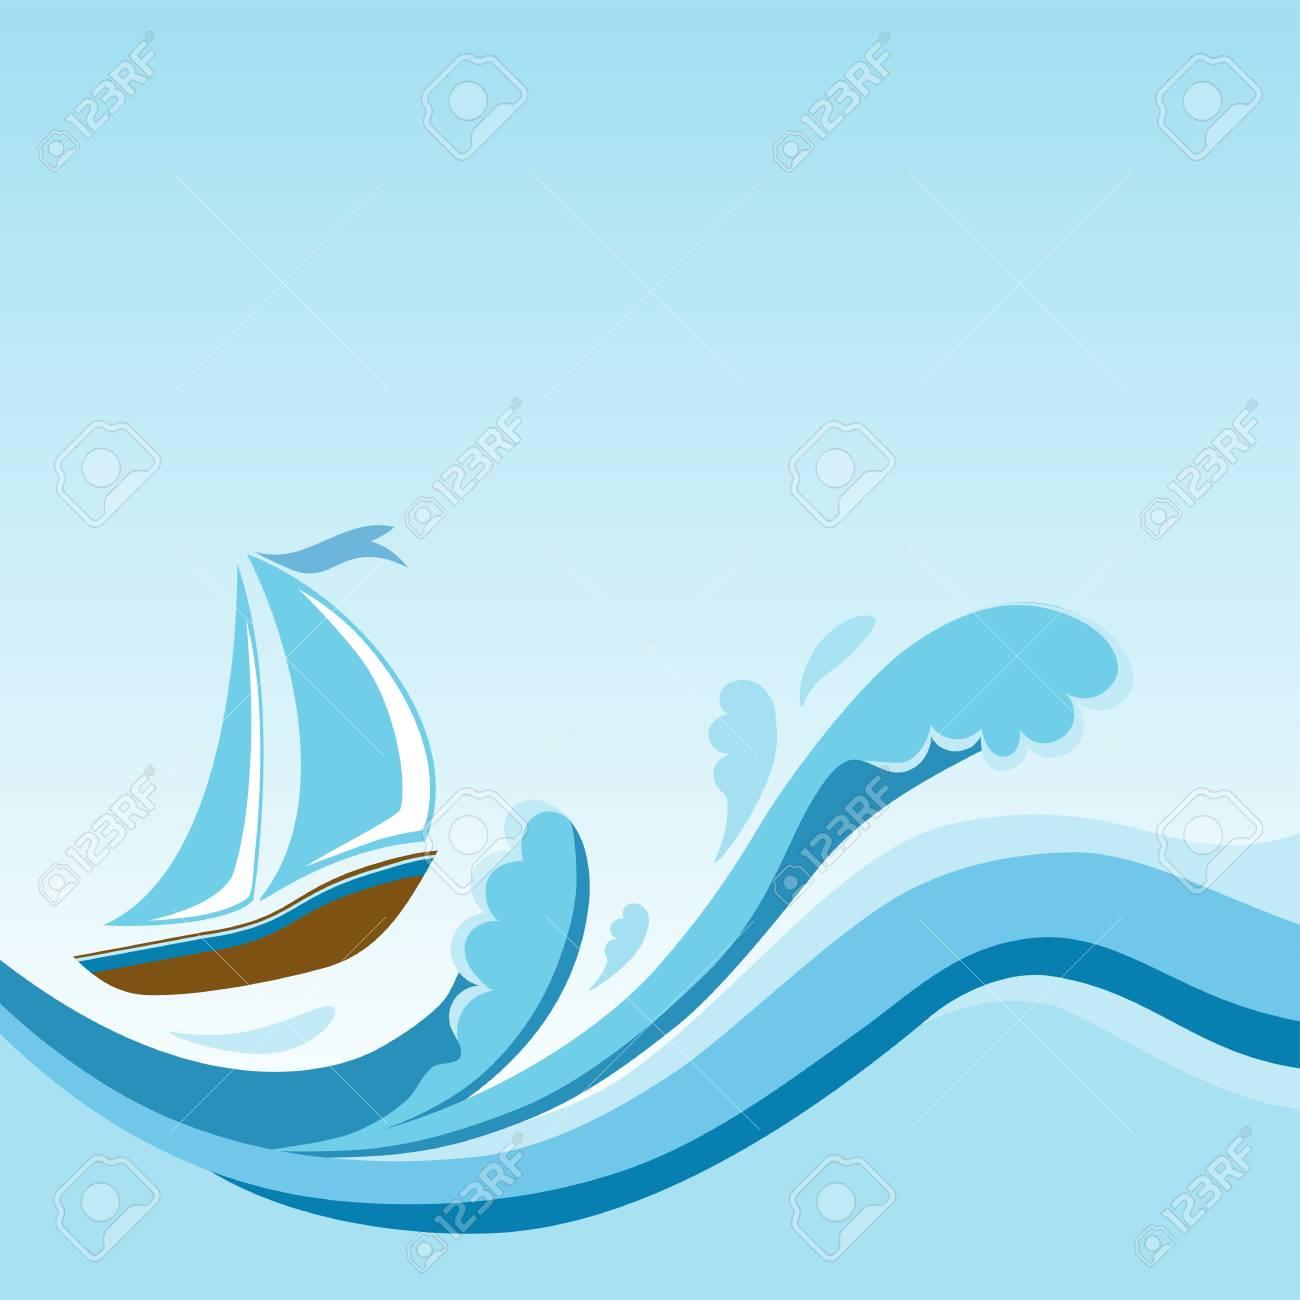 sailboat on sea waves template design royalty free cliparts vectors